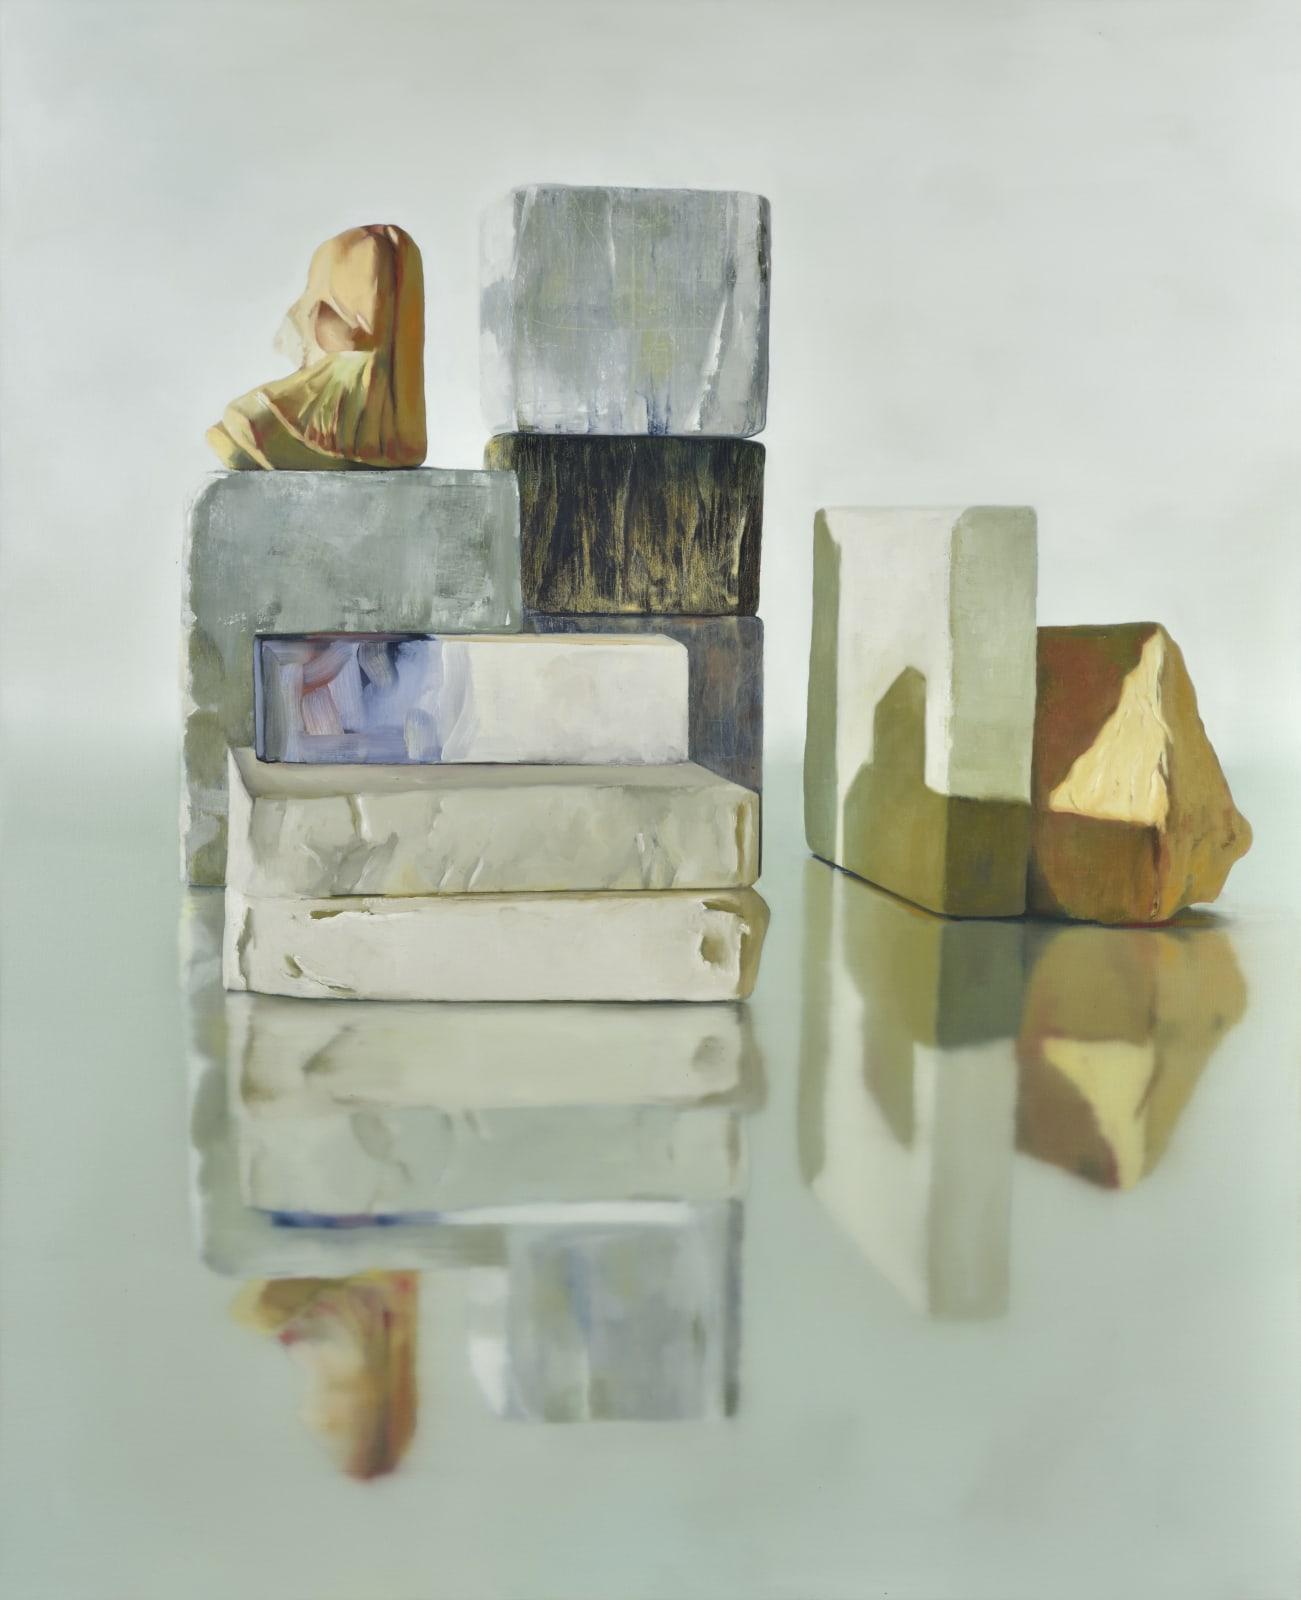 Maude Maris Blocks 2017 oil on canvas 160.0 x 130.0 x 2.0 cm